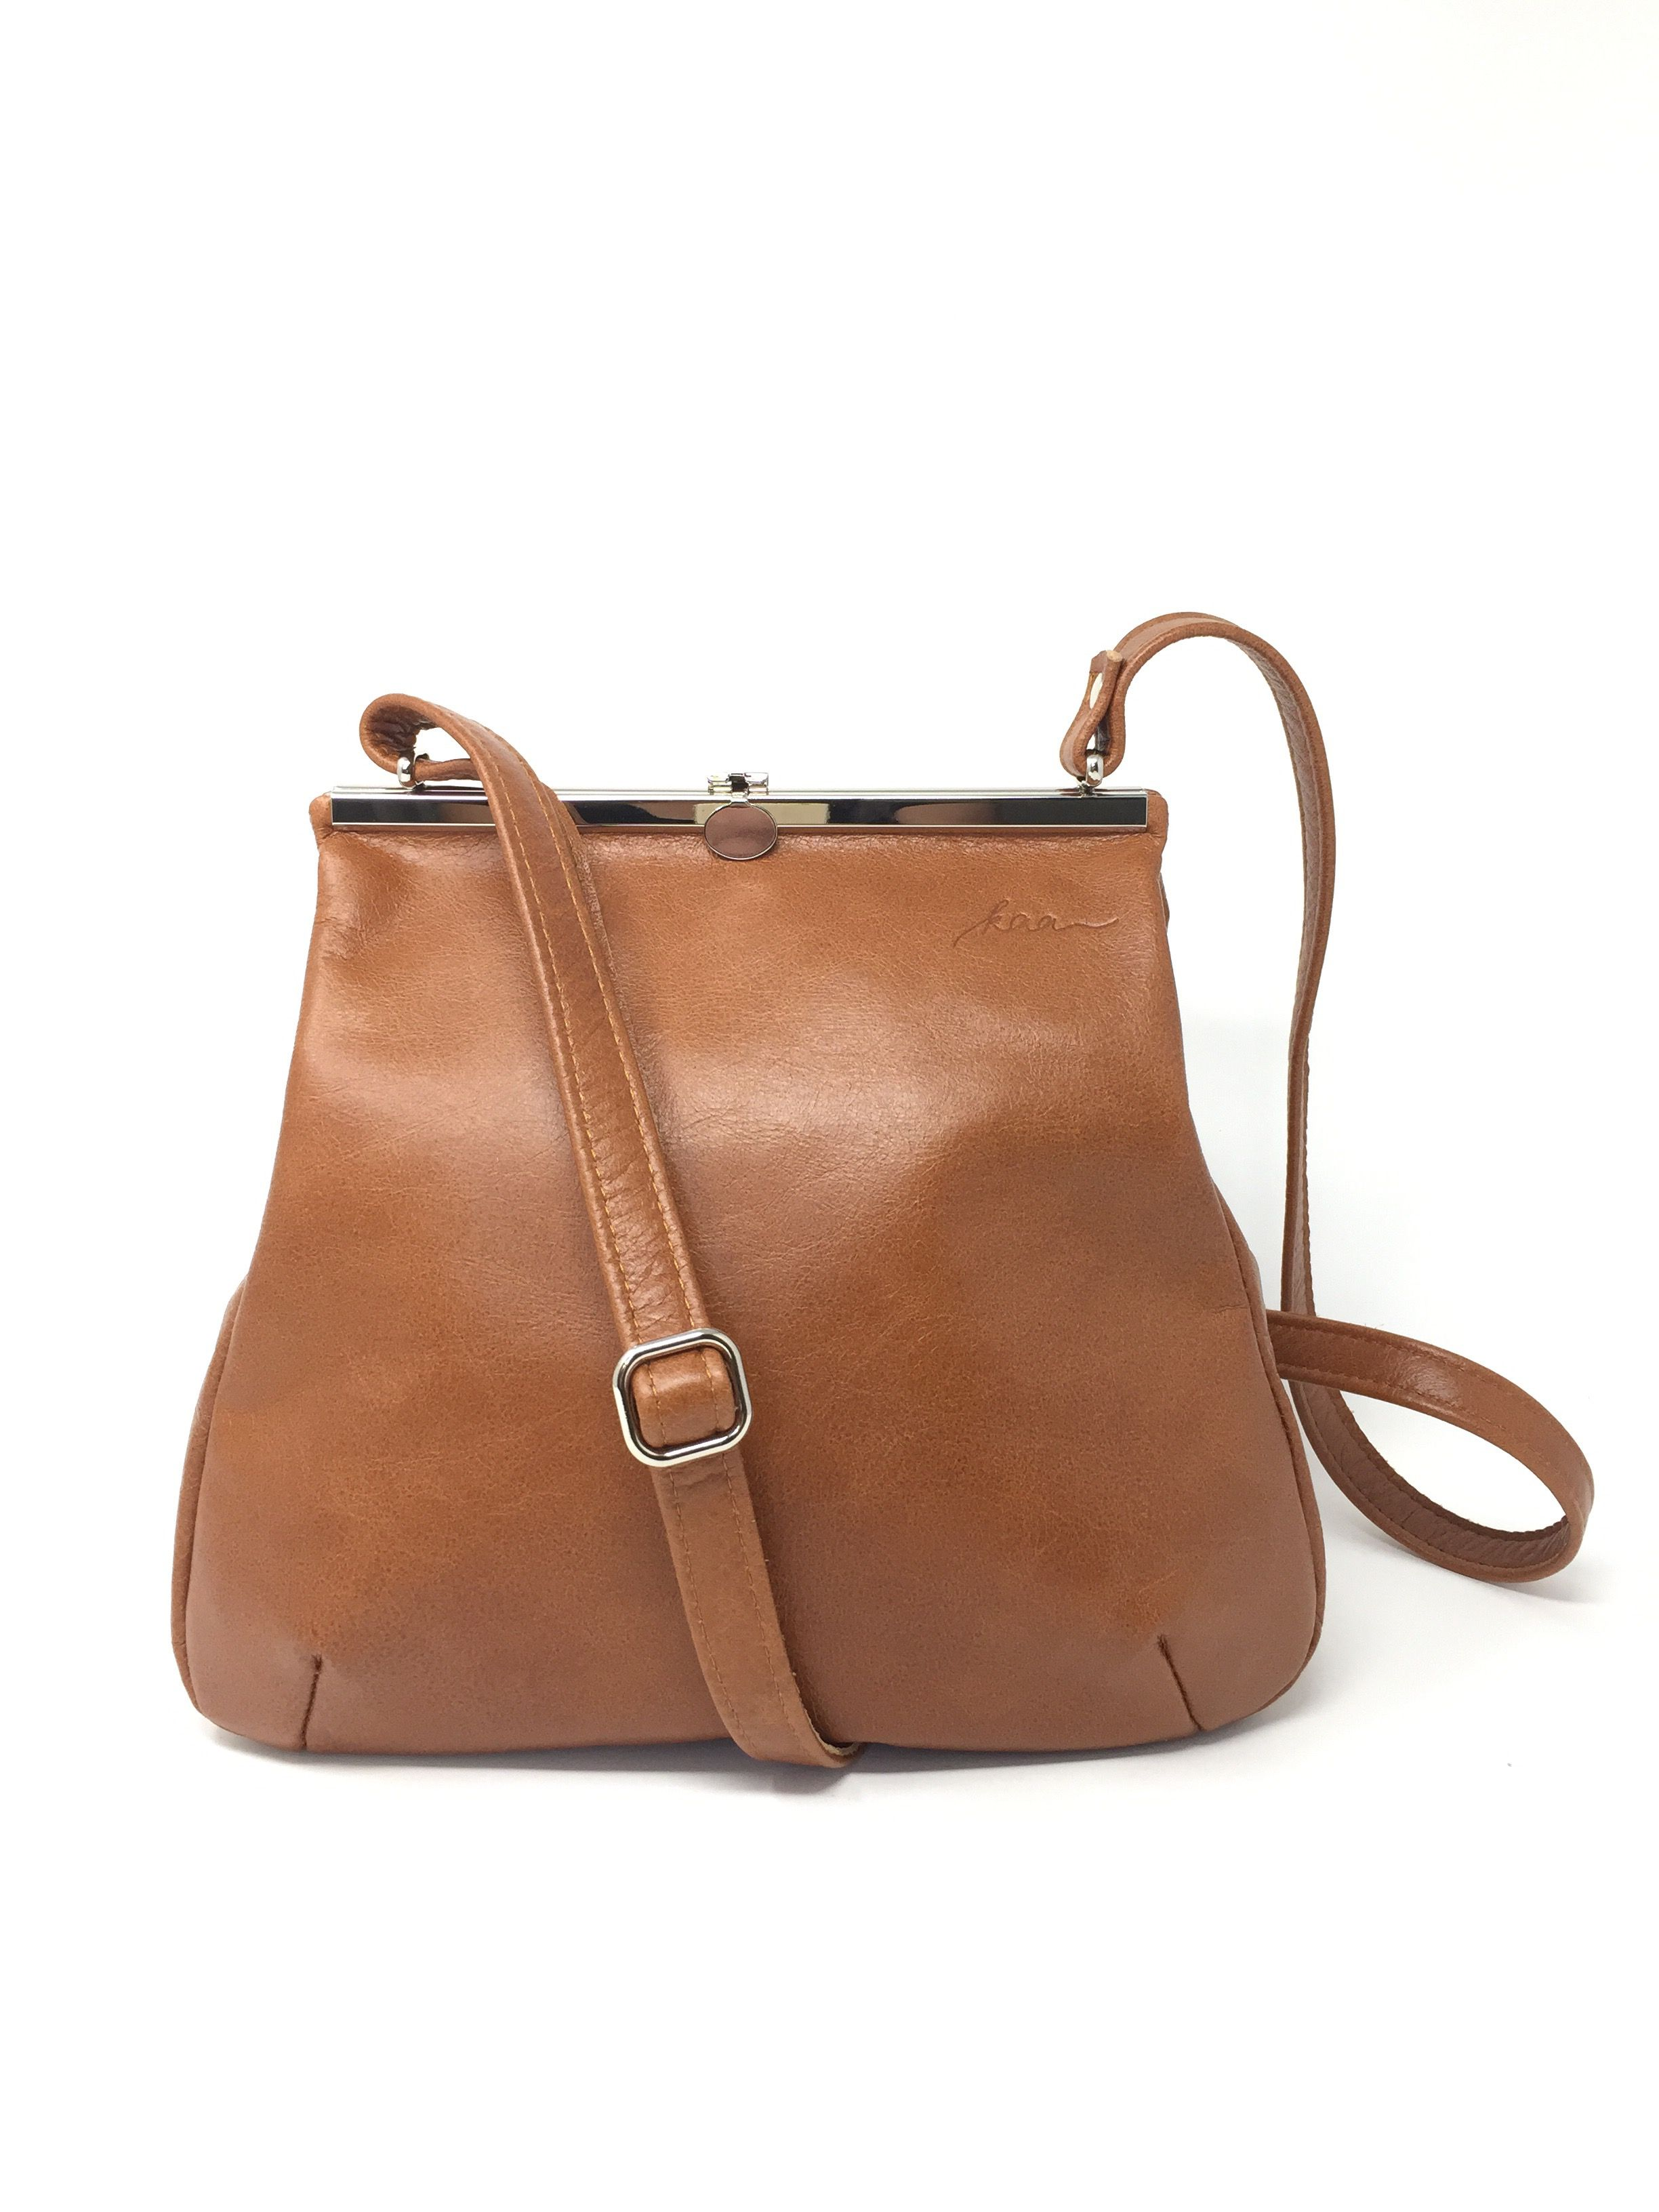 Leconi Umhangetasche Shopper Leder Braun Le0054 Ledertasche Damen Ledertasche Damen Braun Taschen